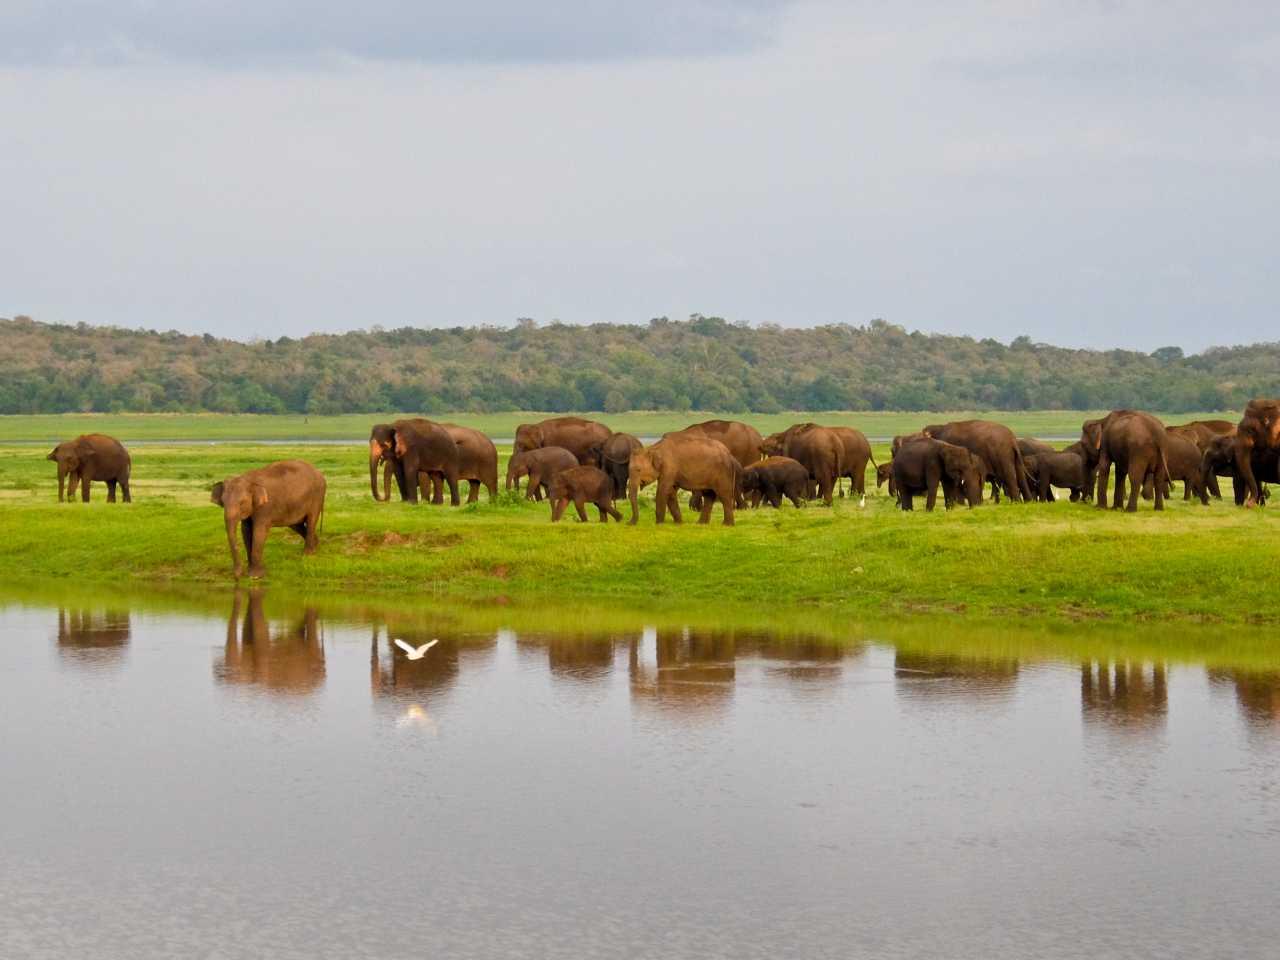 Sri Lanka road trip - Elephants Reflection